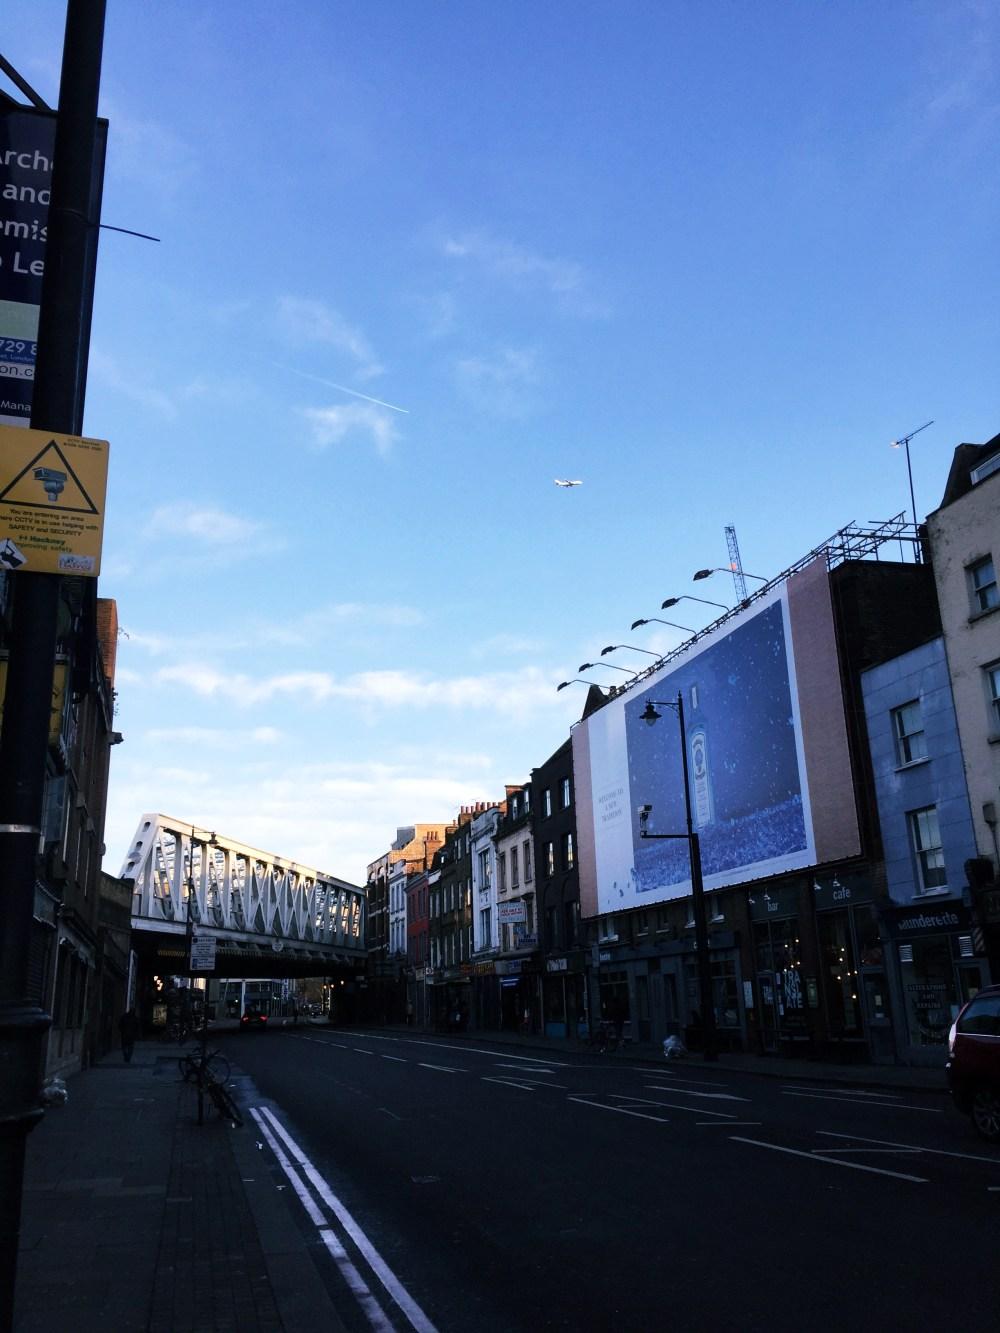 11 Dec 2016: Old Street x Kingsland Road   London, England